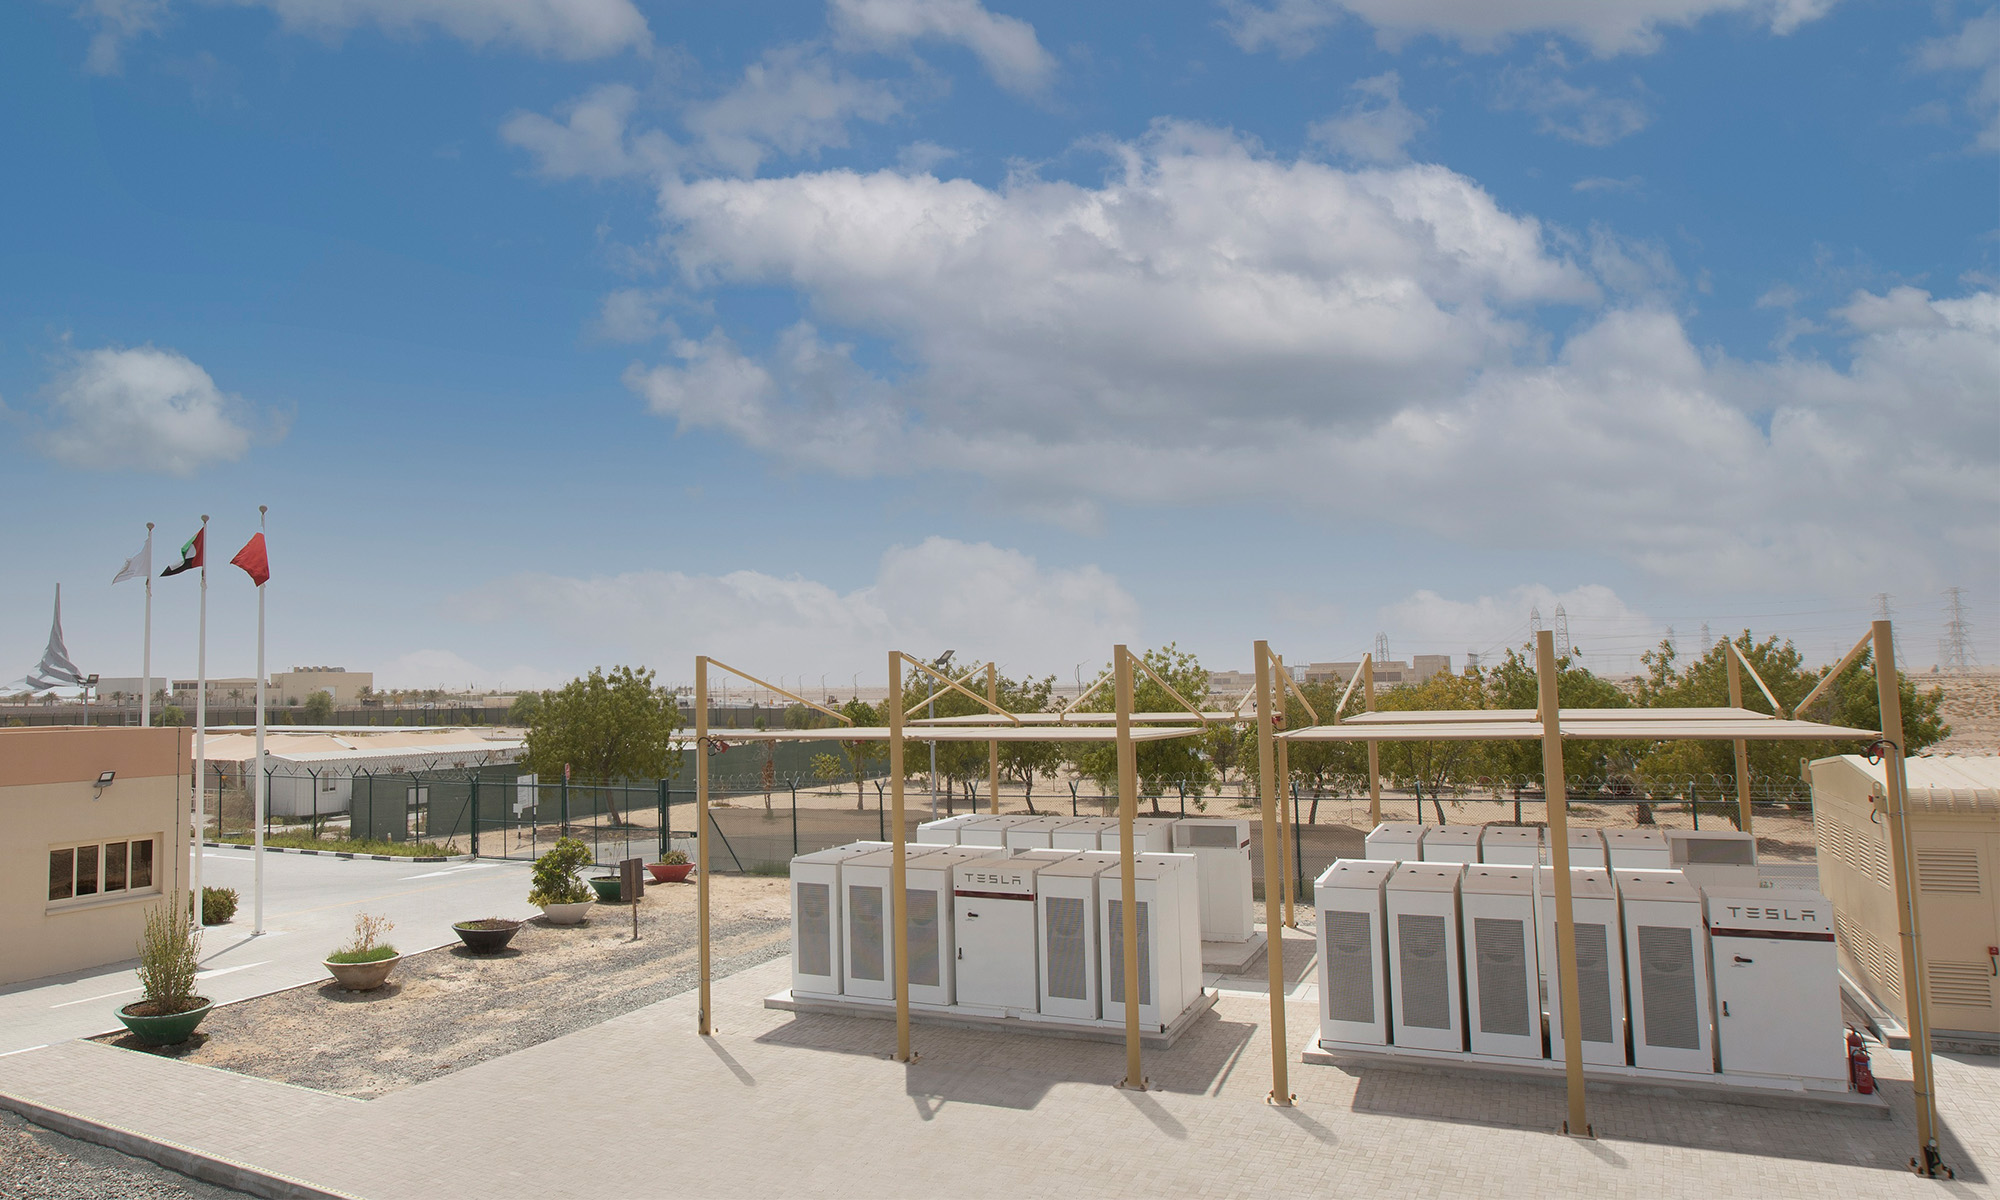 tesla batteries store sun's power at world's biggest solar farm in dubai